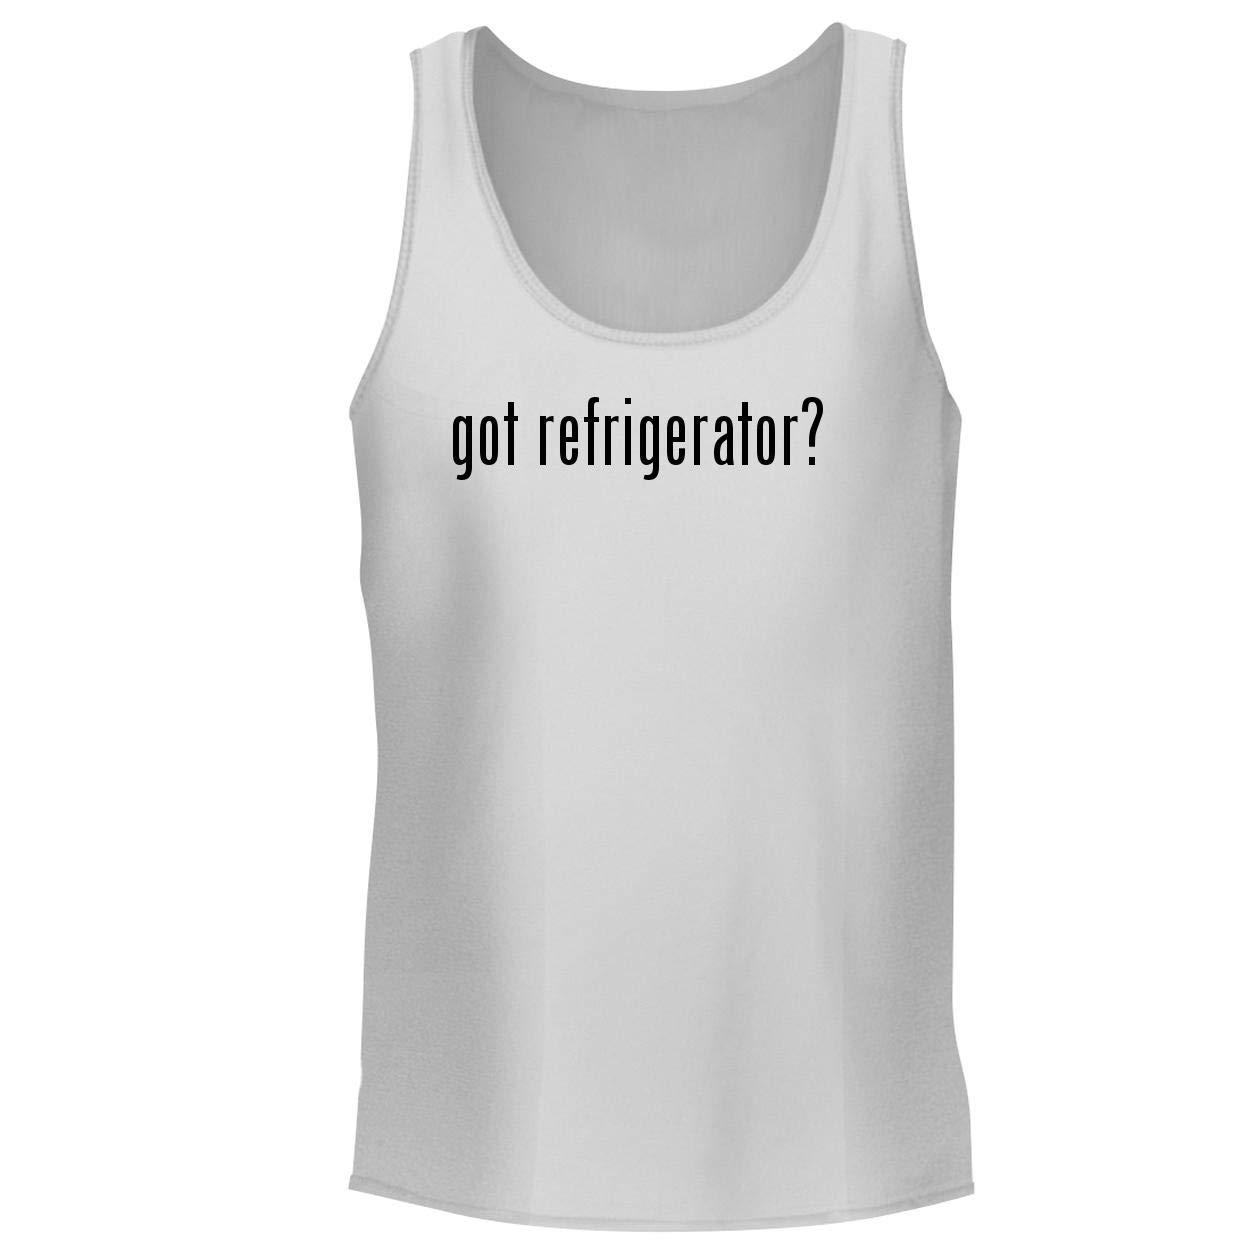 BH Cool Designs got Refrigerator? - Men